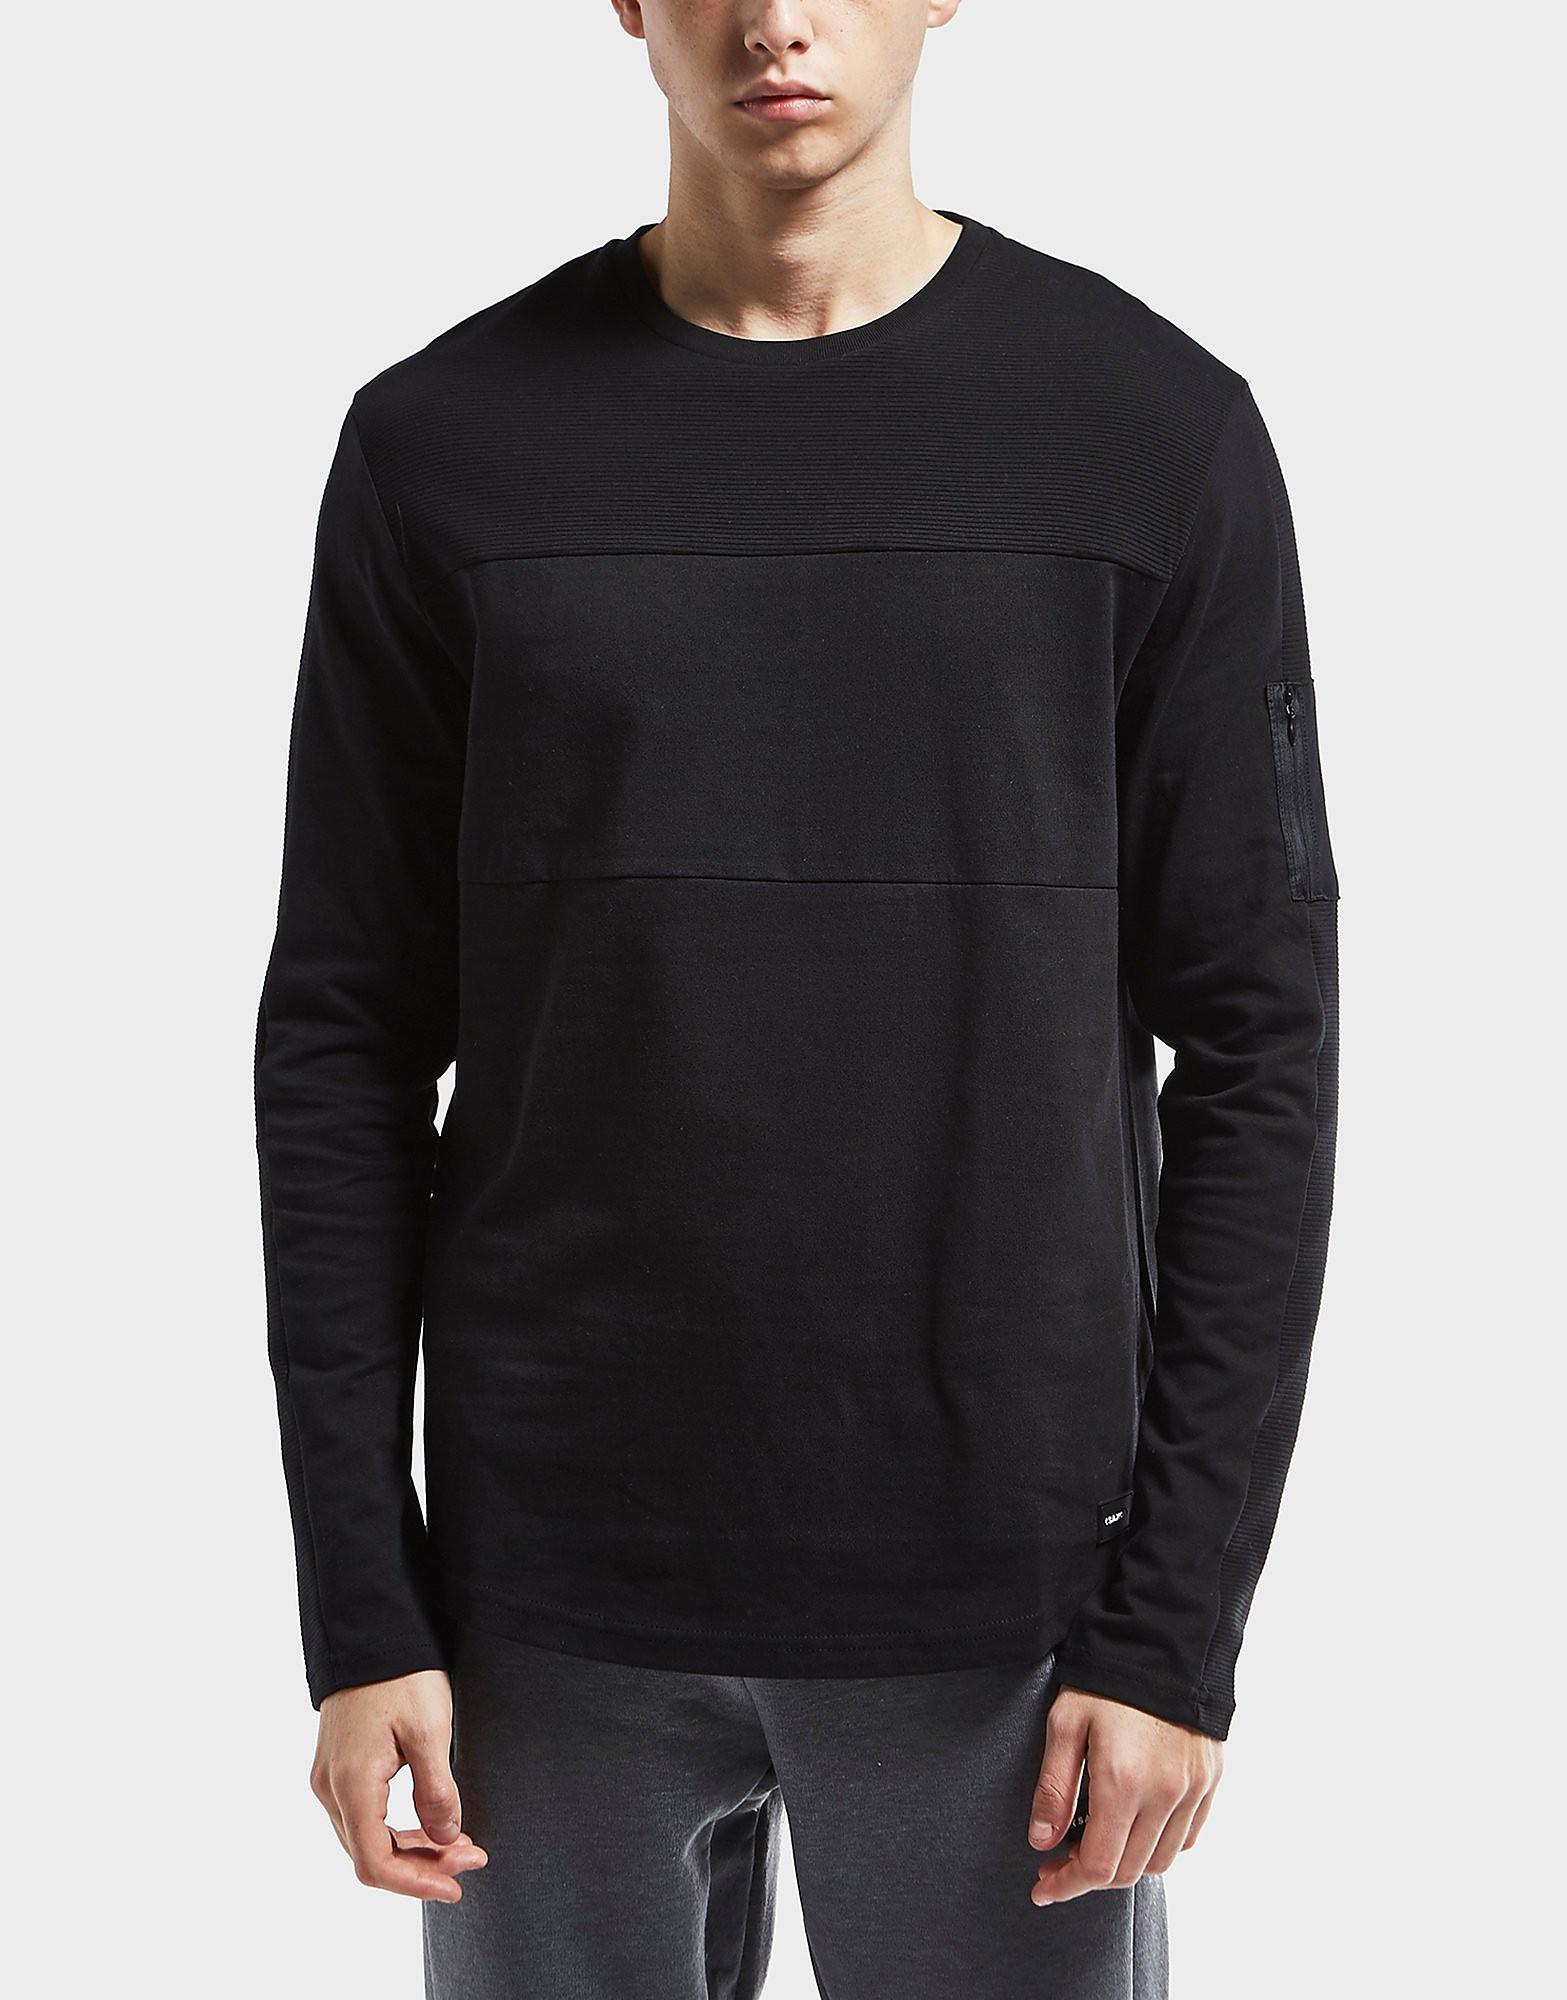 One True Saxon Levels Long Sleeve T-Shirt